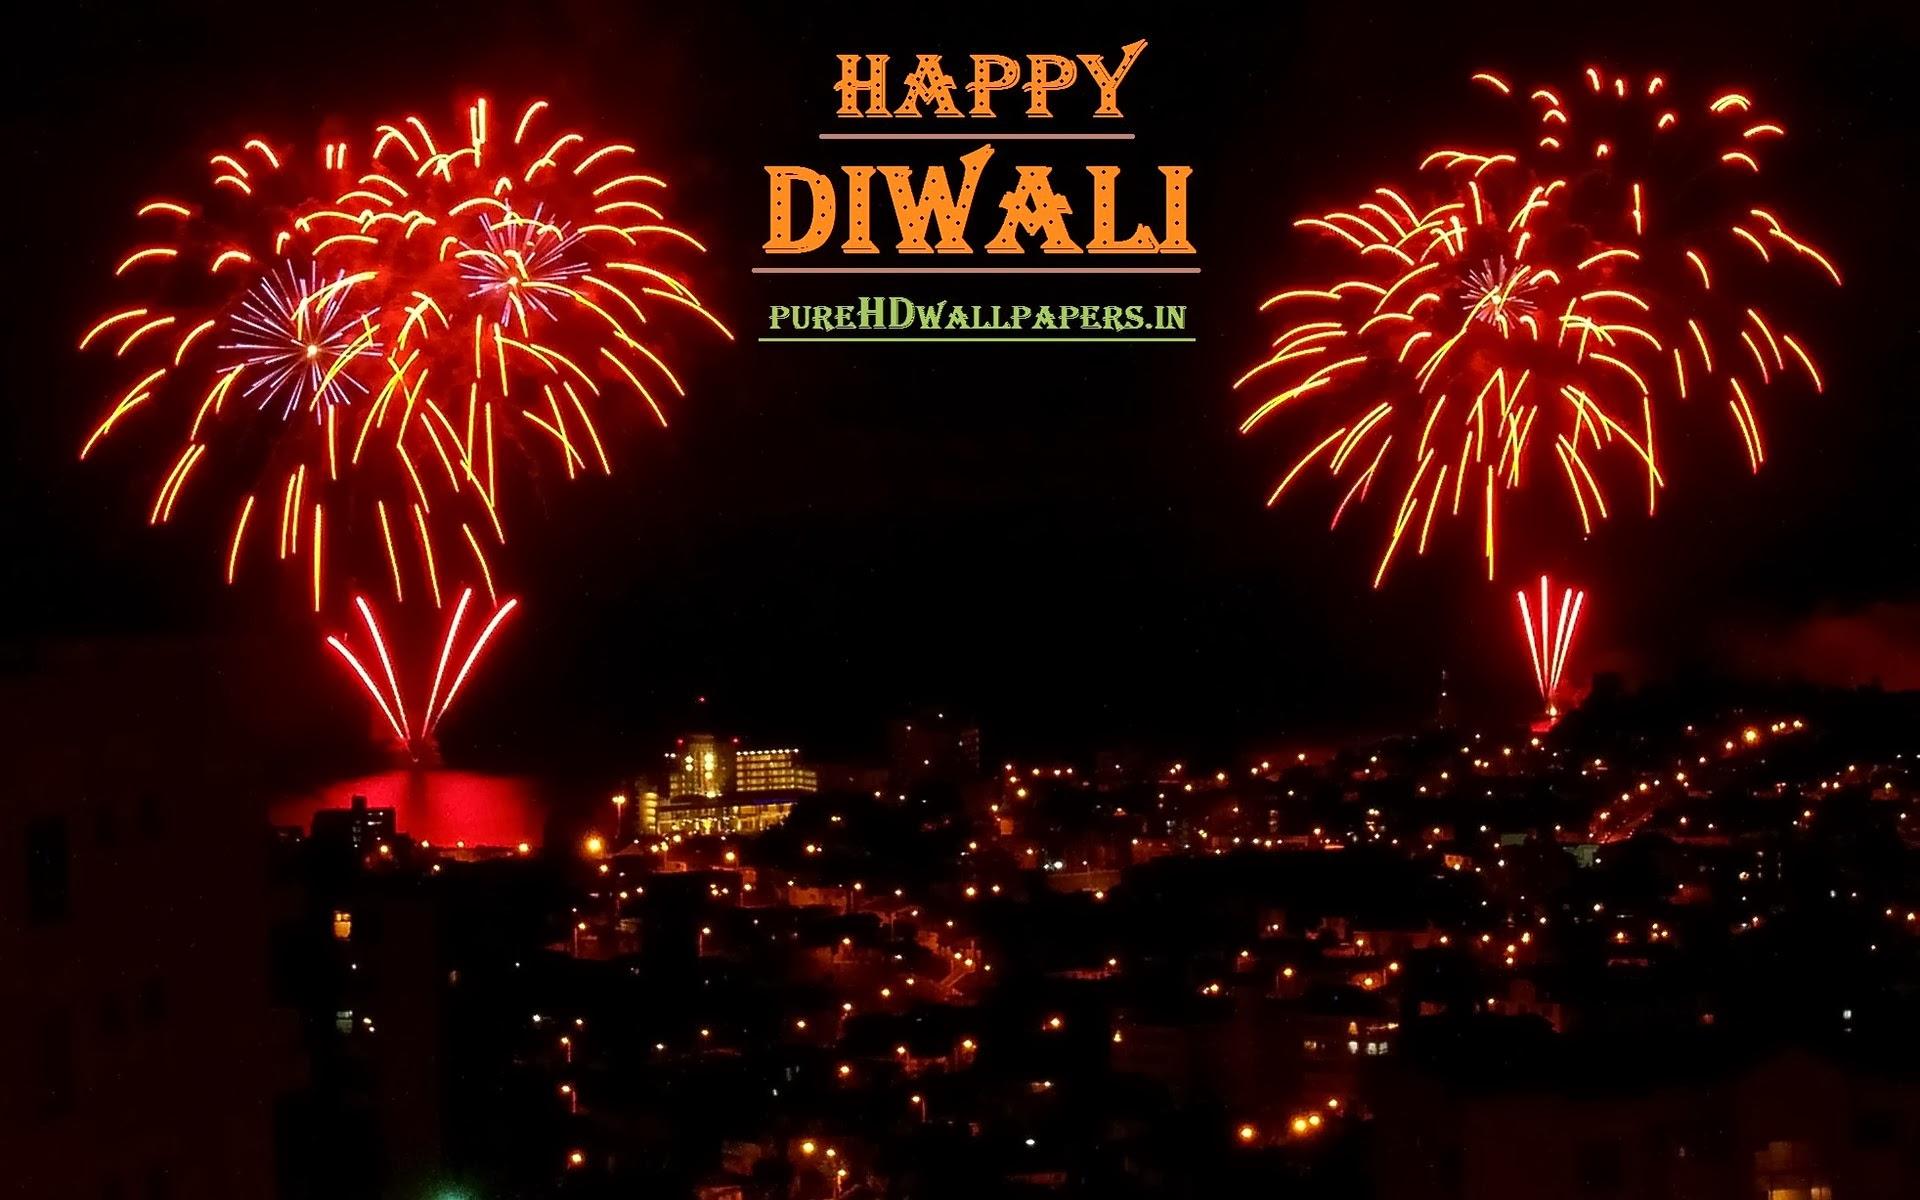 happy diwali widescreen hd - photo #28